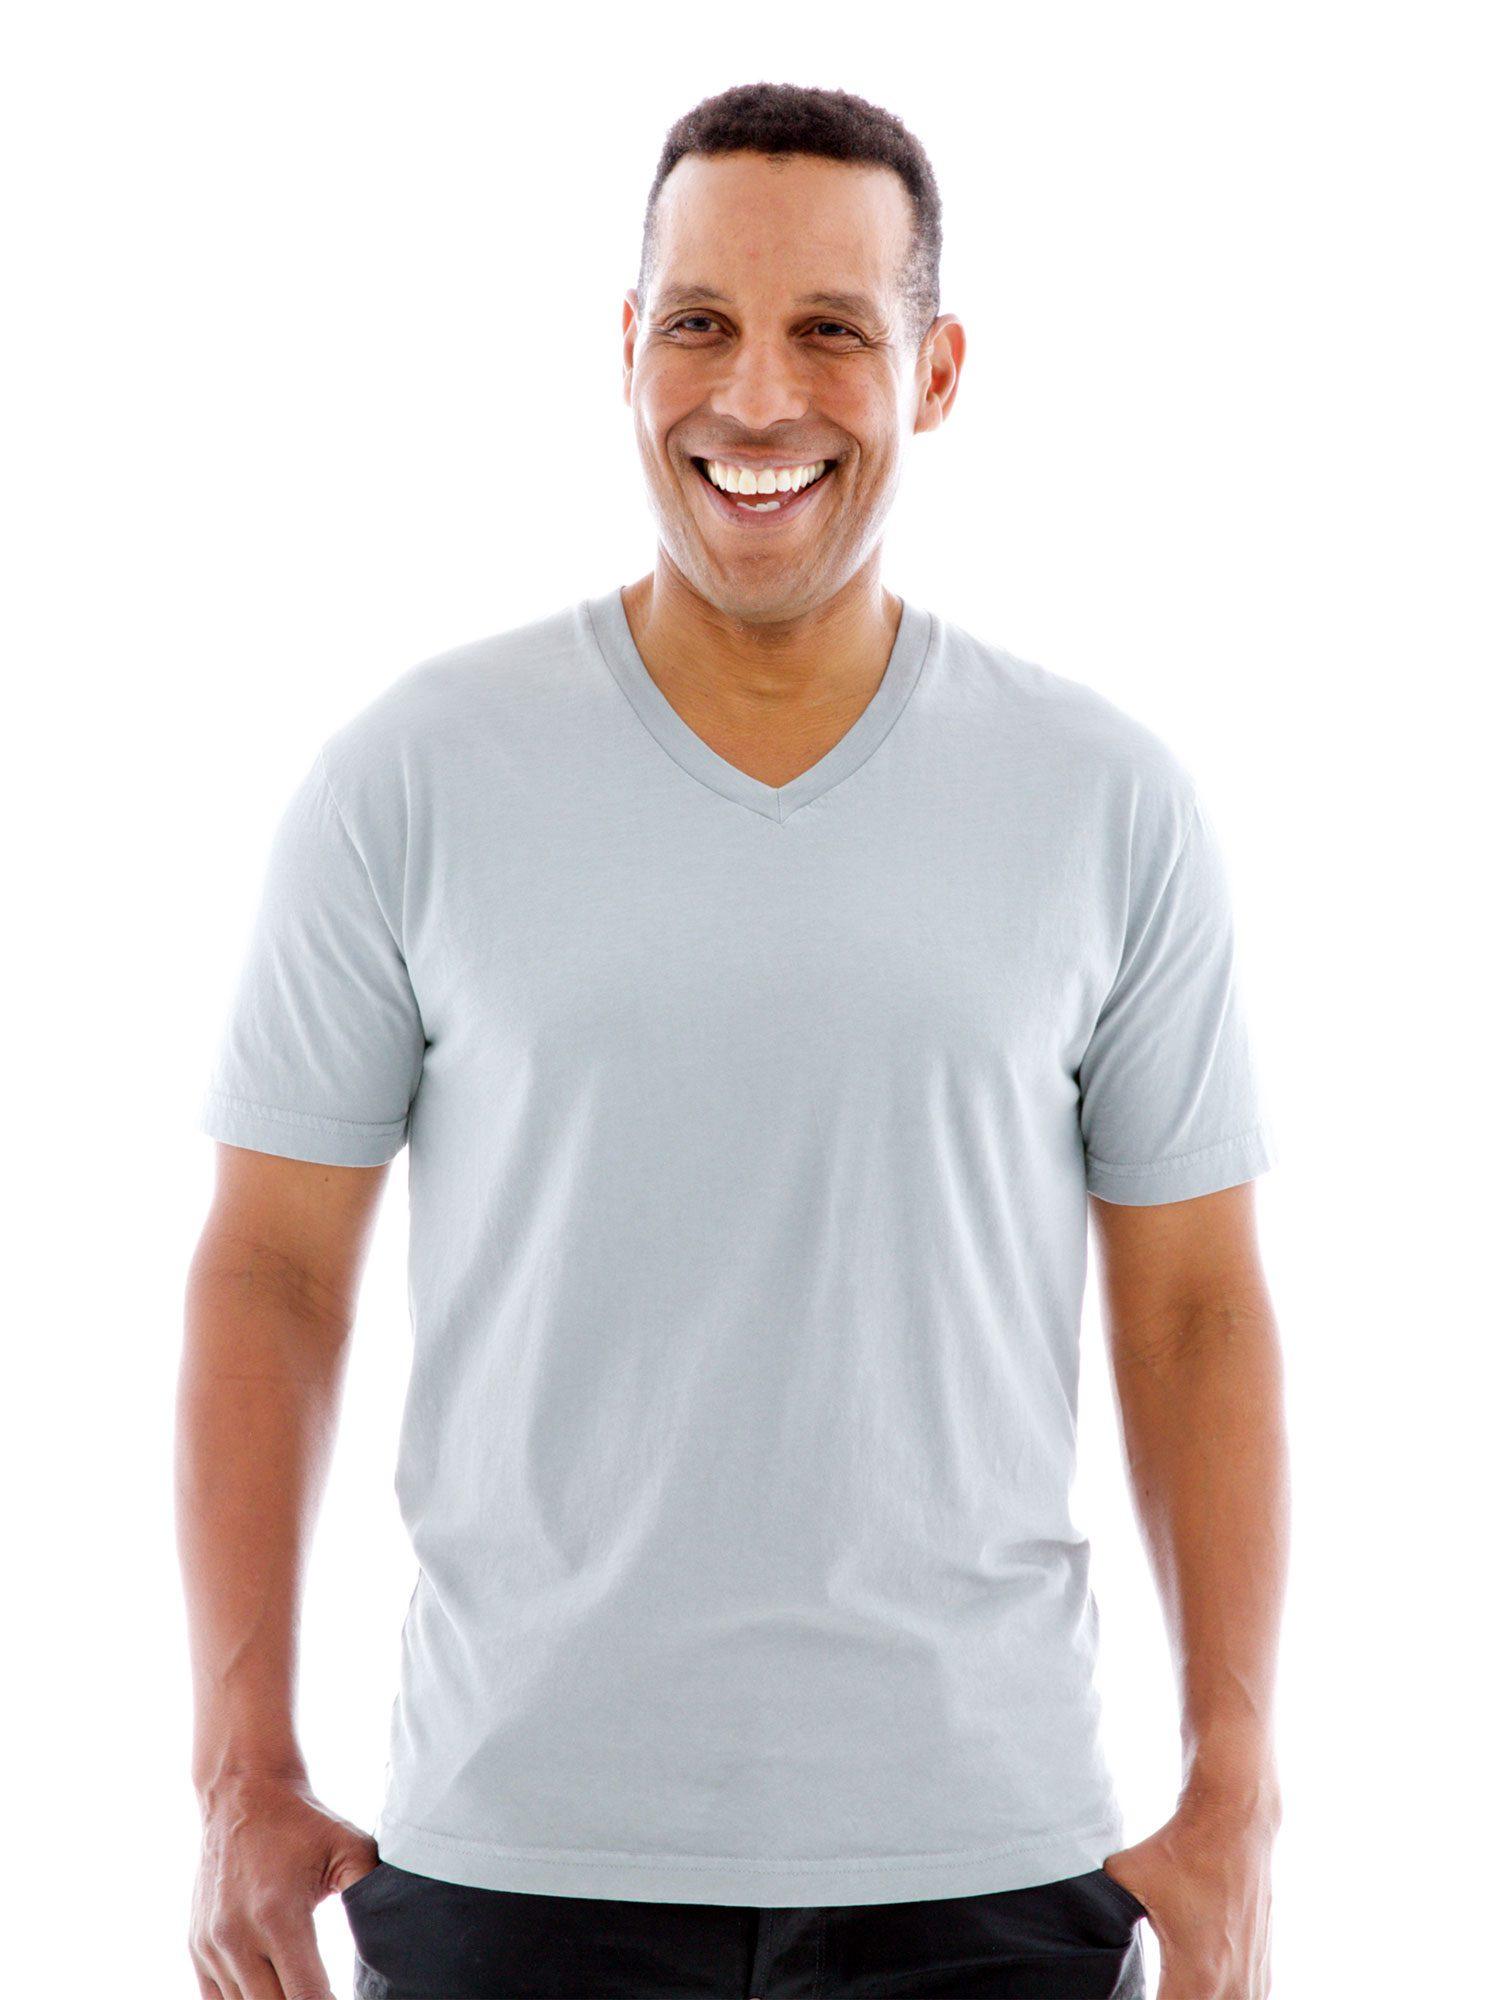 Fine Jersey V-neck Short Sleeve T-Shirt Front View